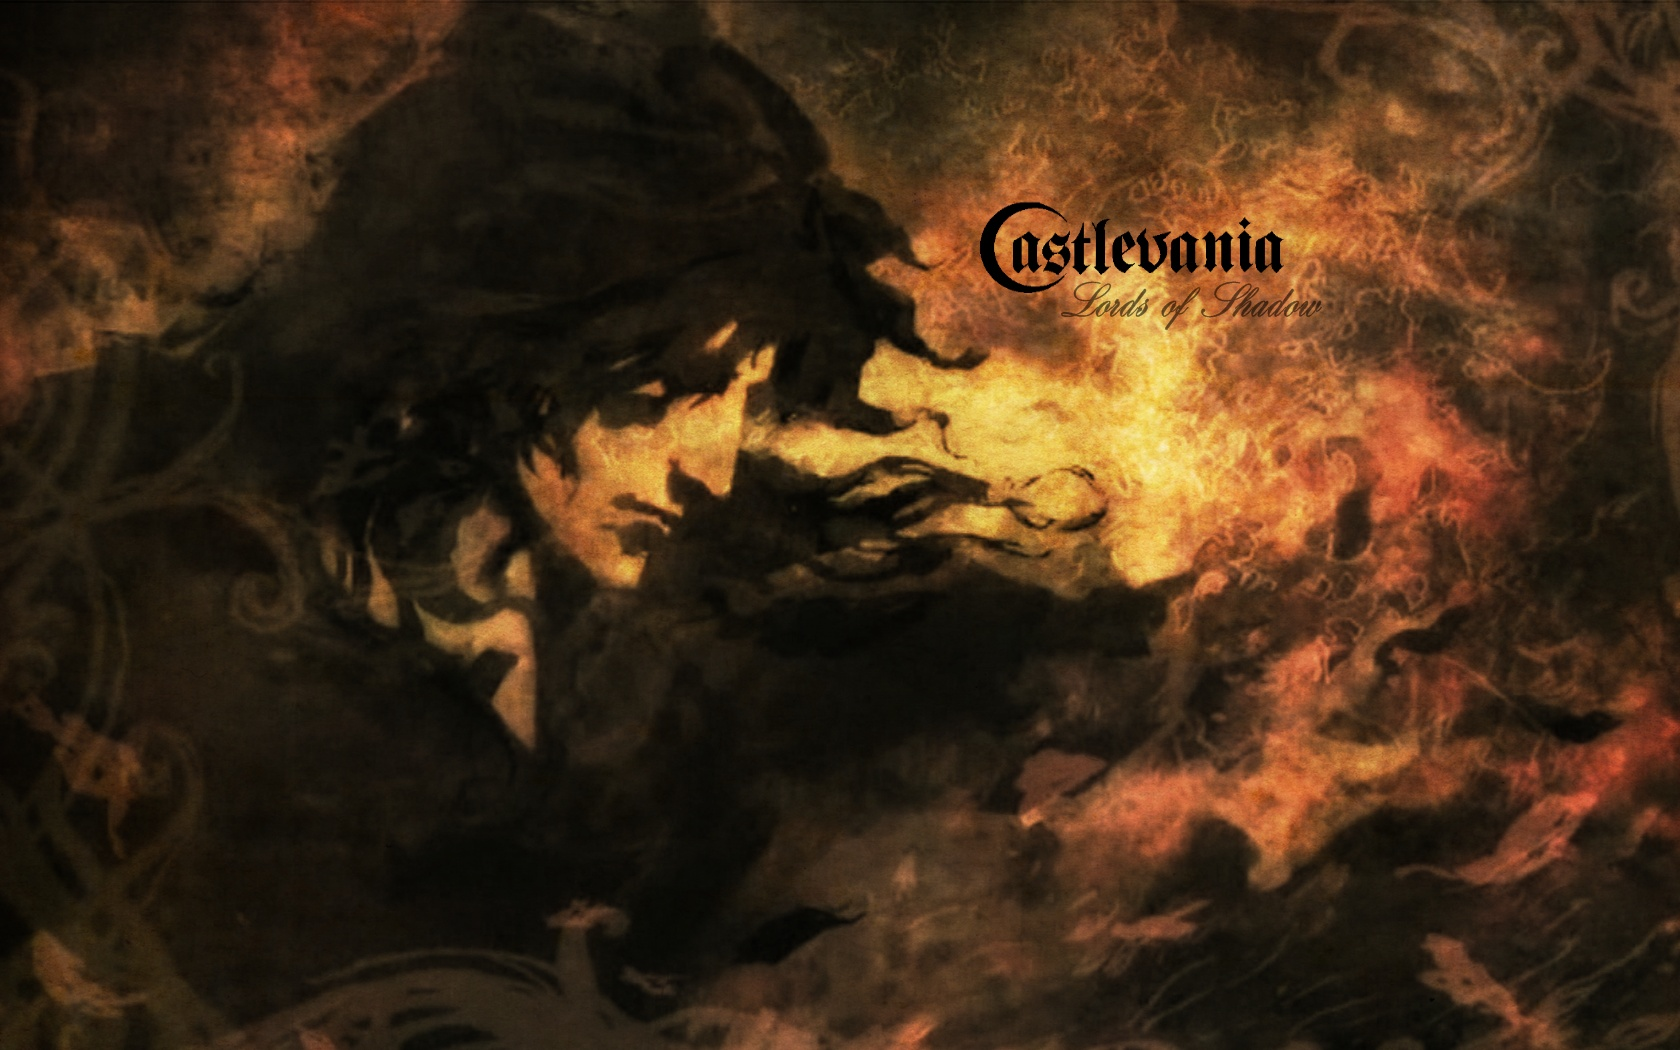 E3 2010: Castlevania Lords of Shadow trailer